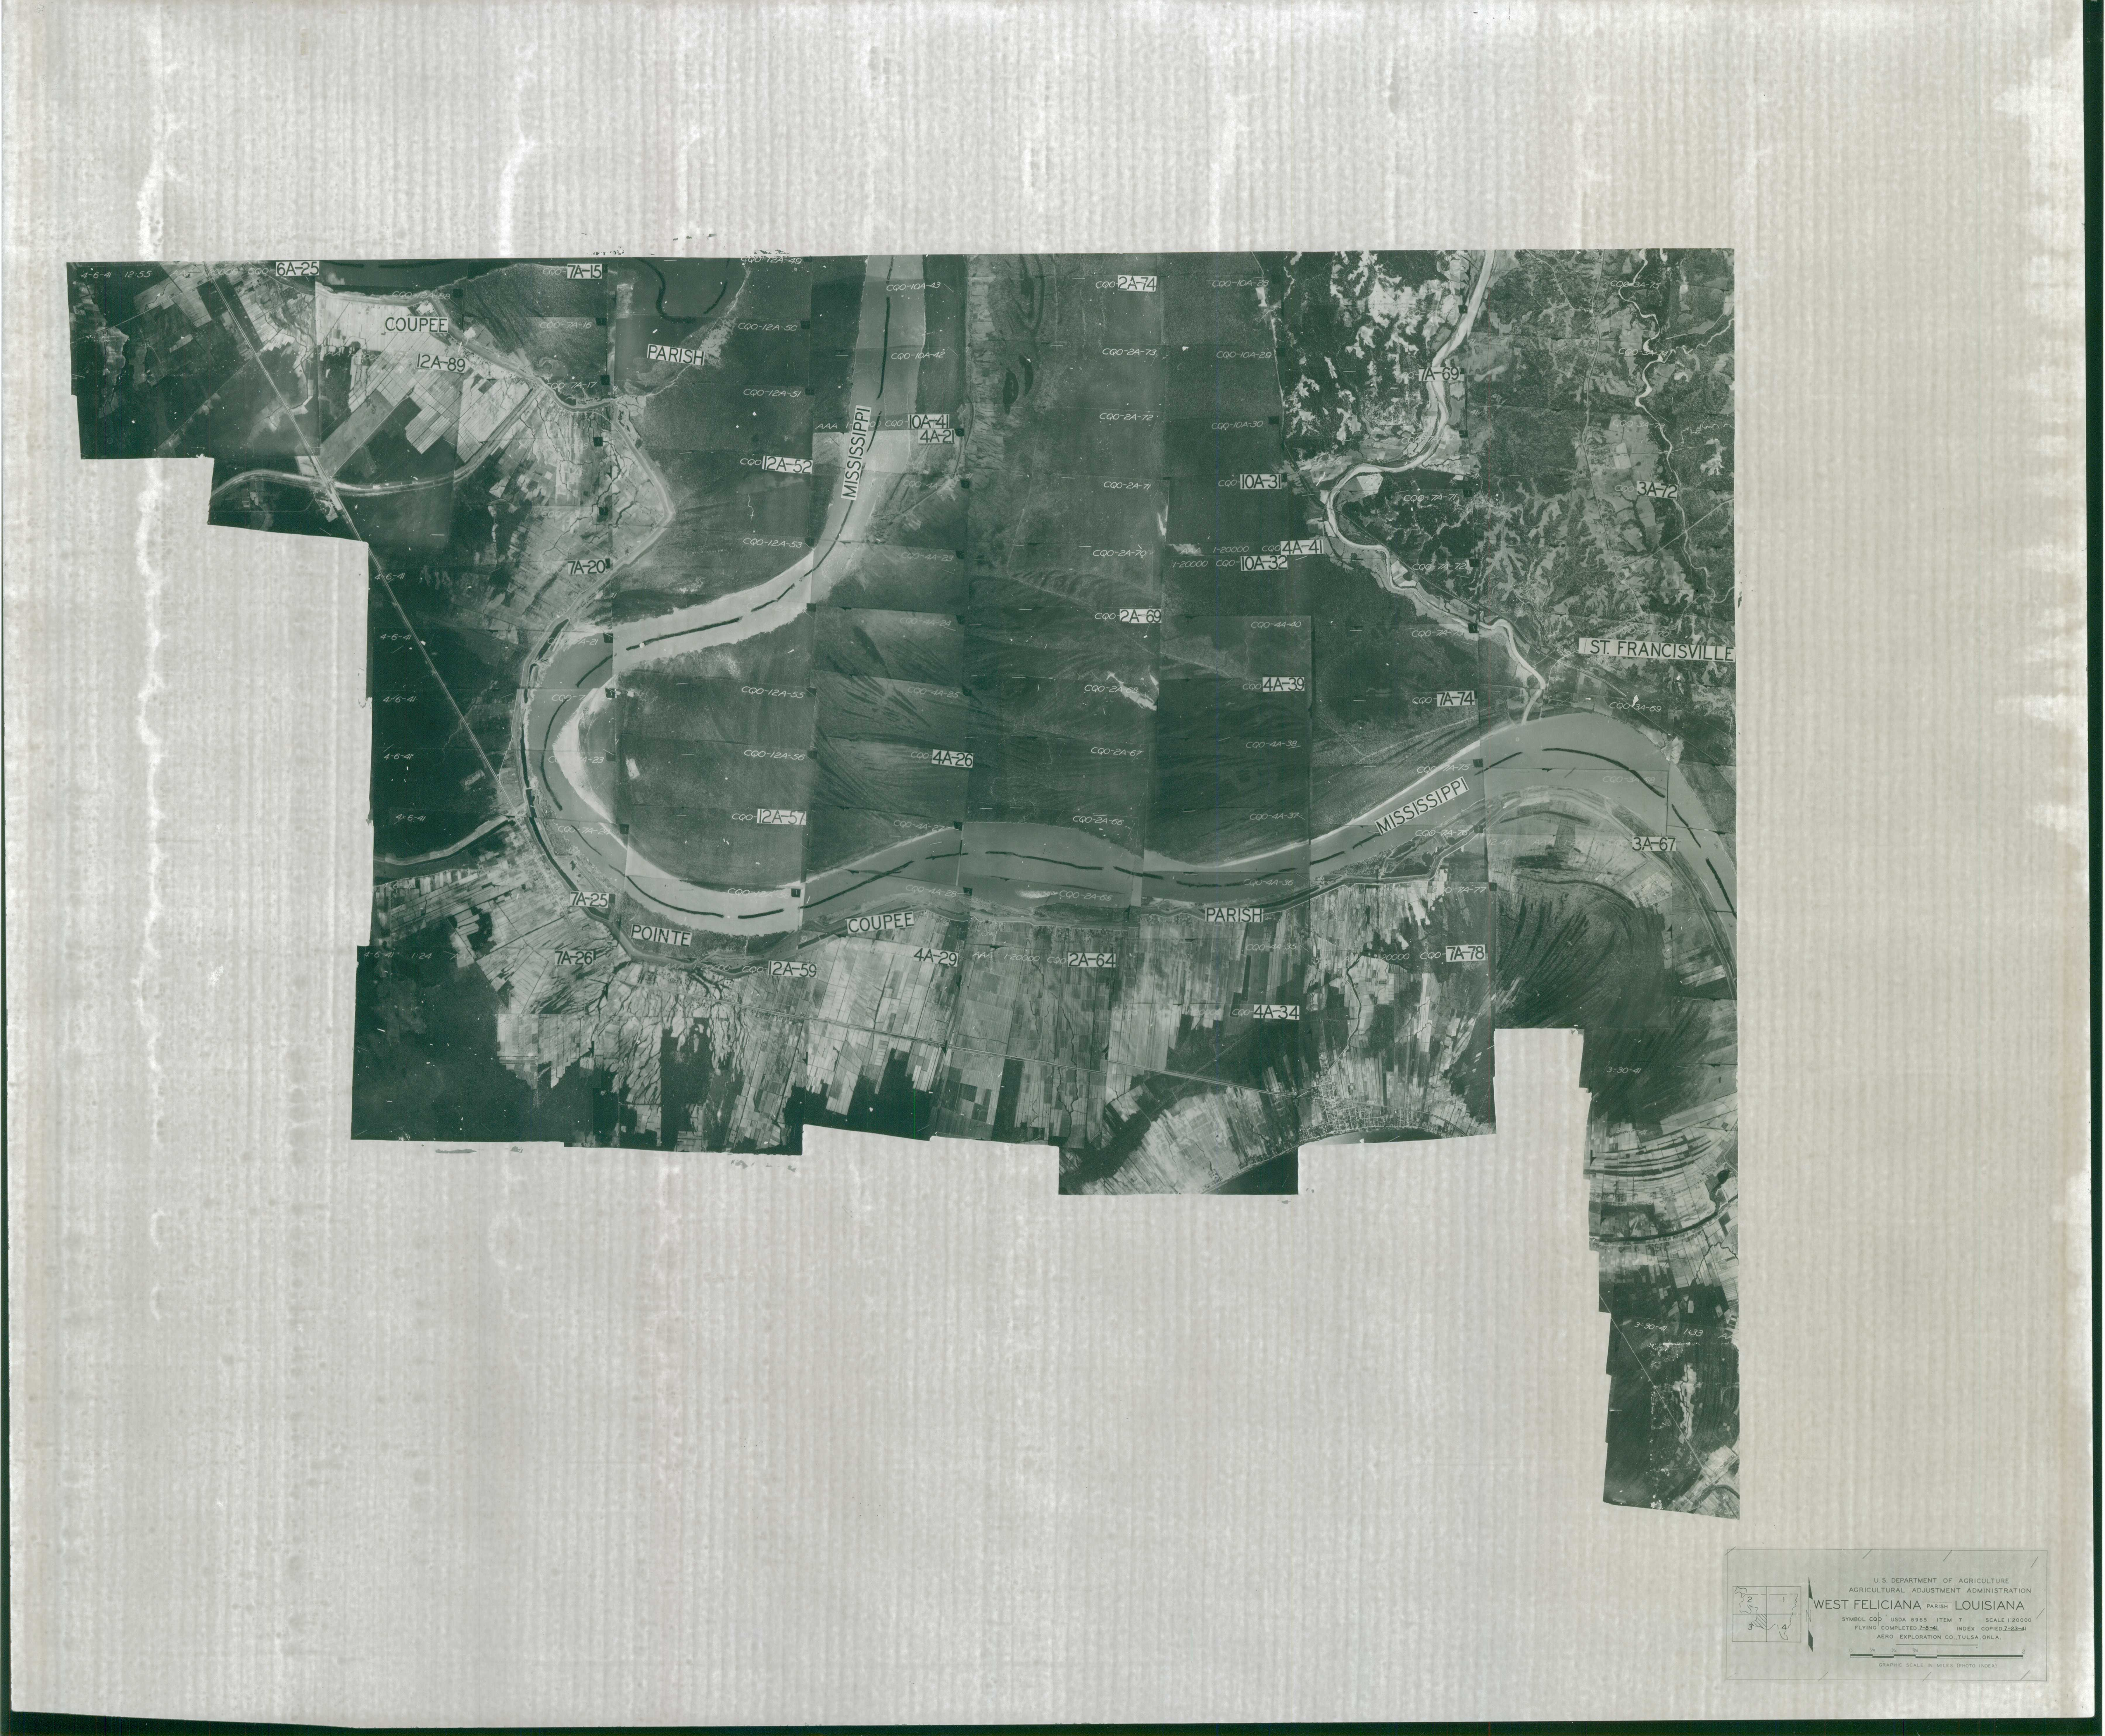 Index to Aerial Photography of West Feliciana Parish, Louisiana 3